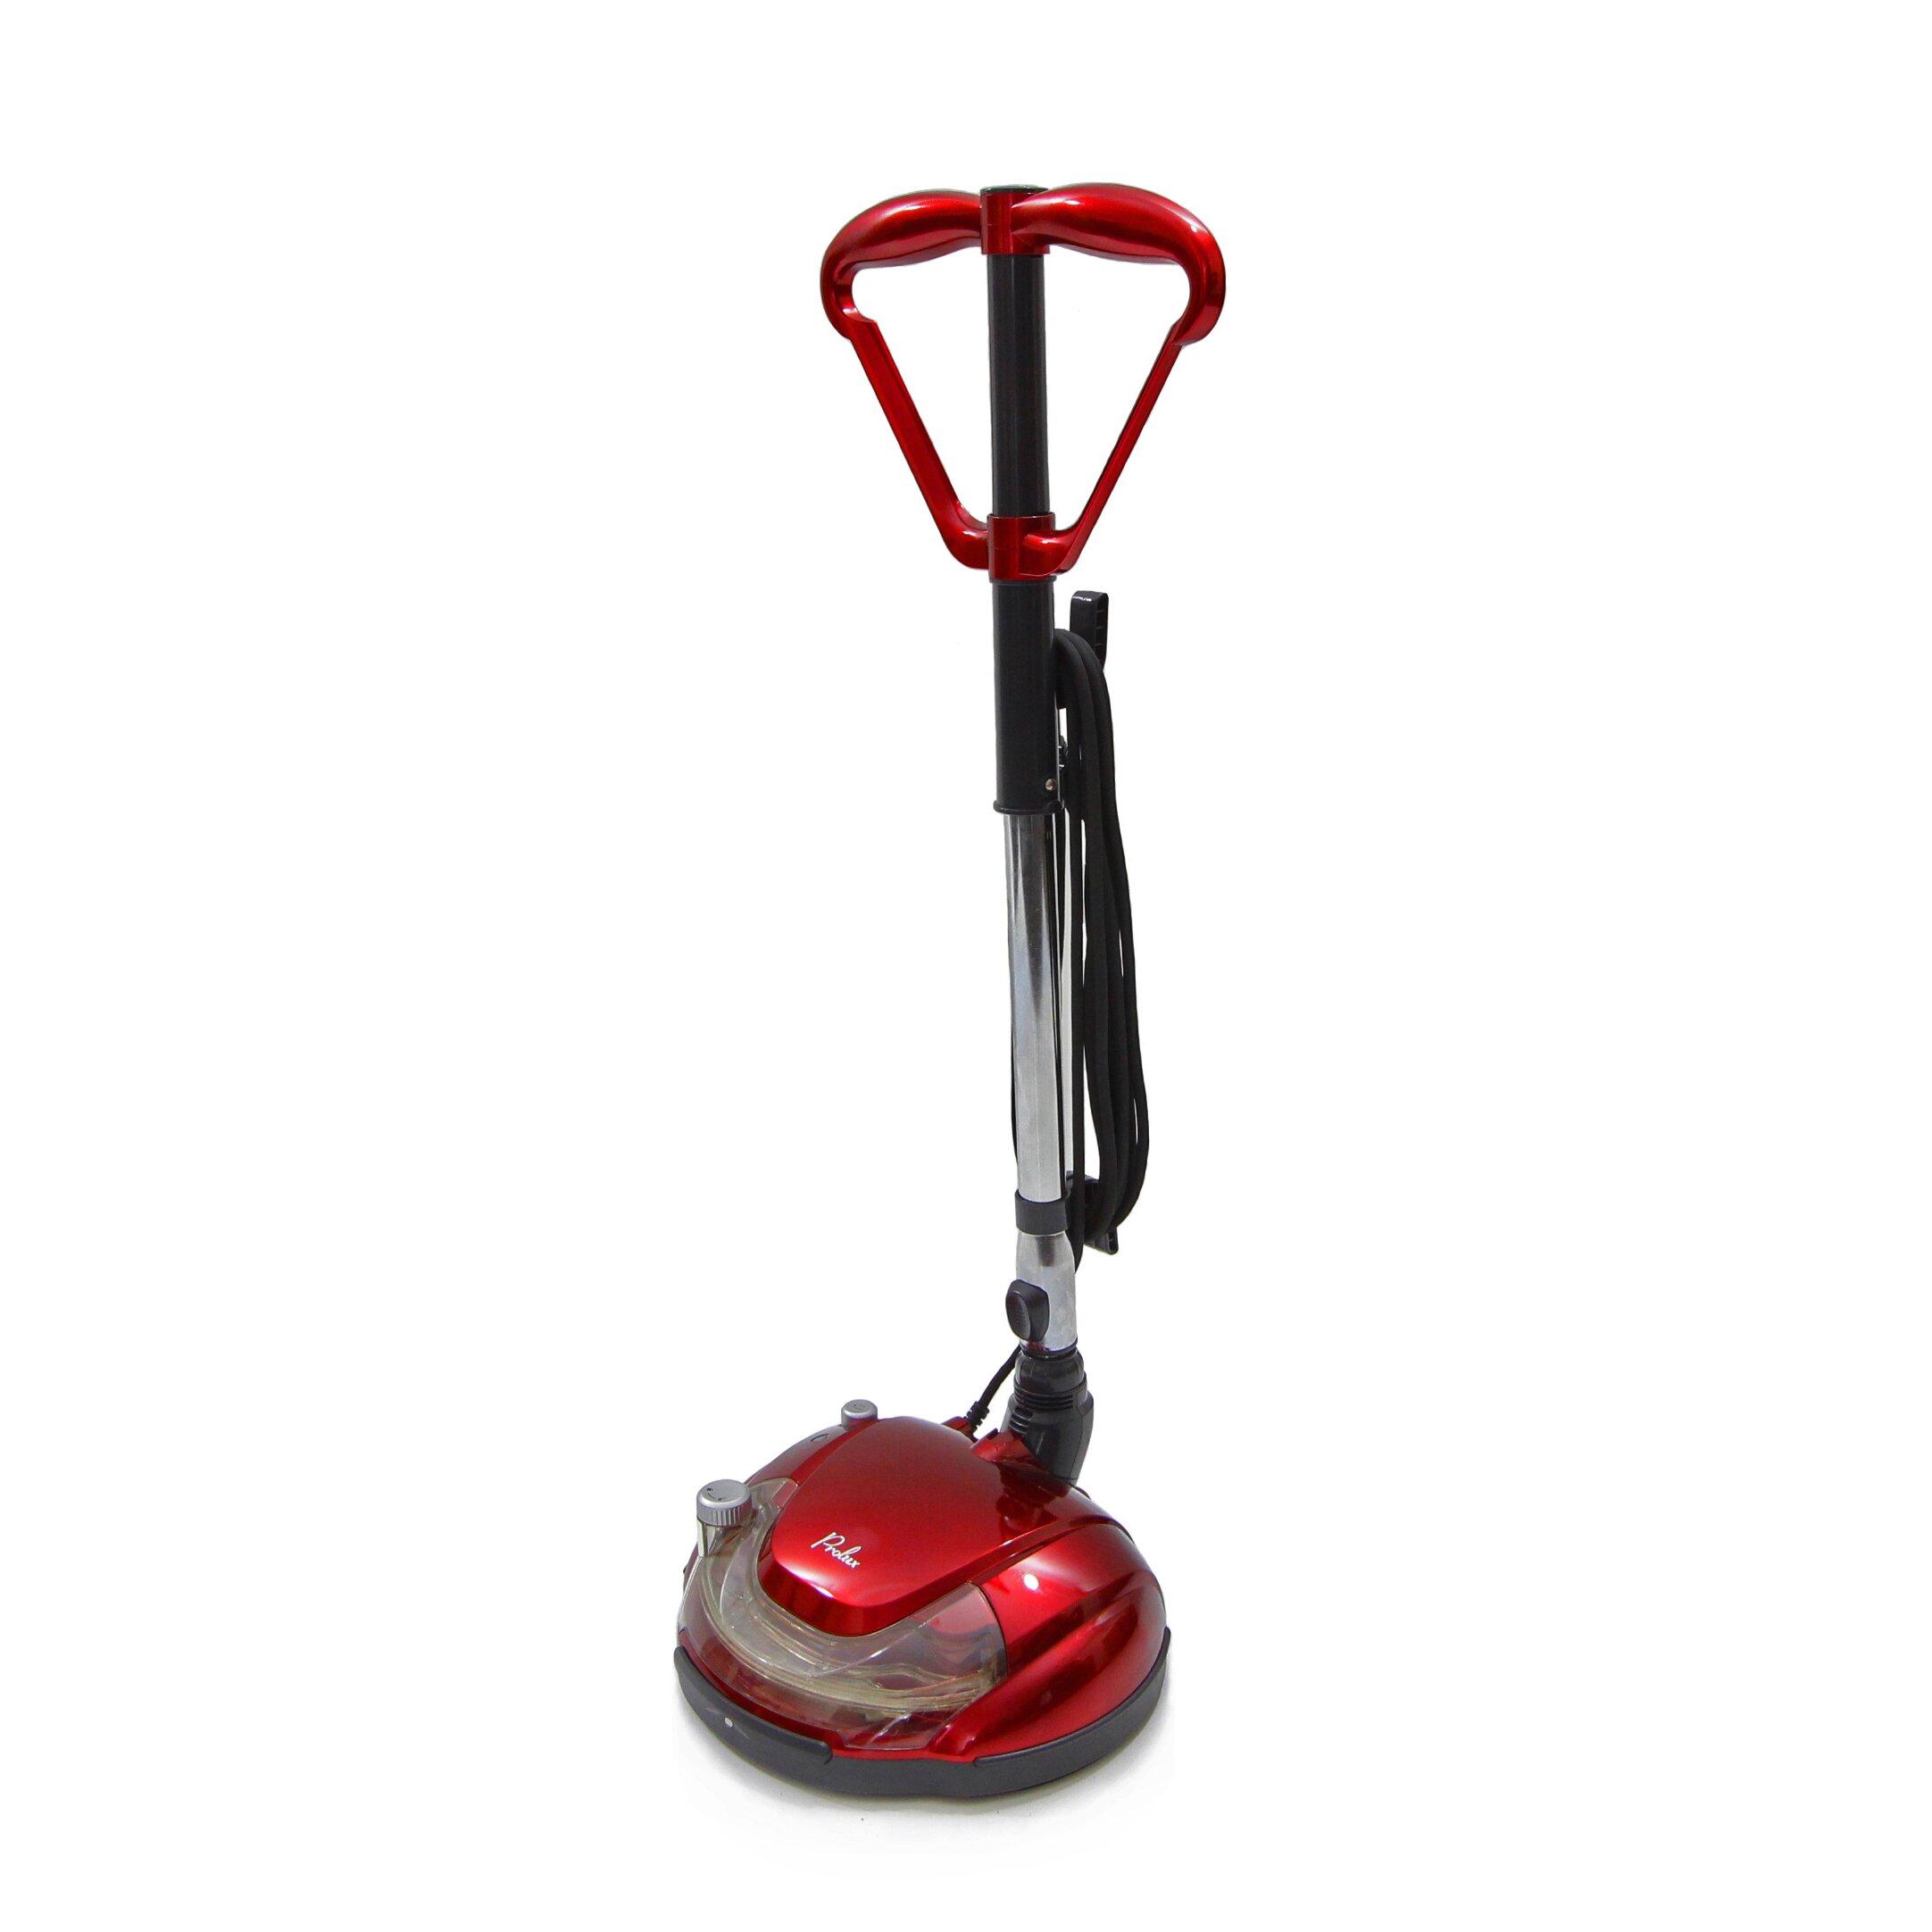 Prolux Hard Floor Cleaner Polisher Buffer Hardwood Grout